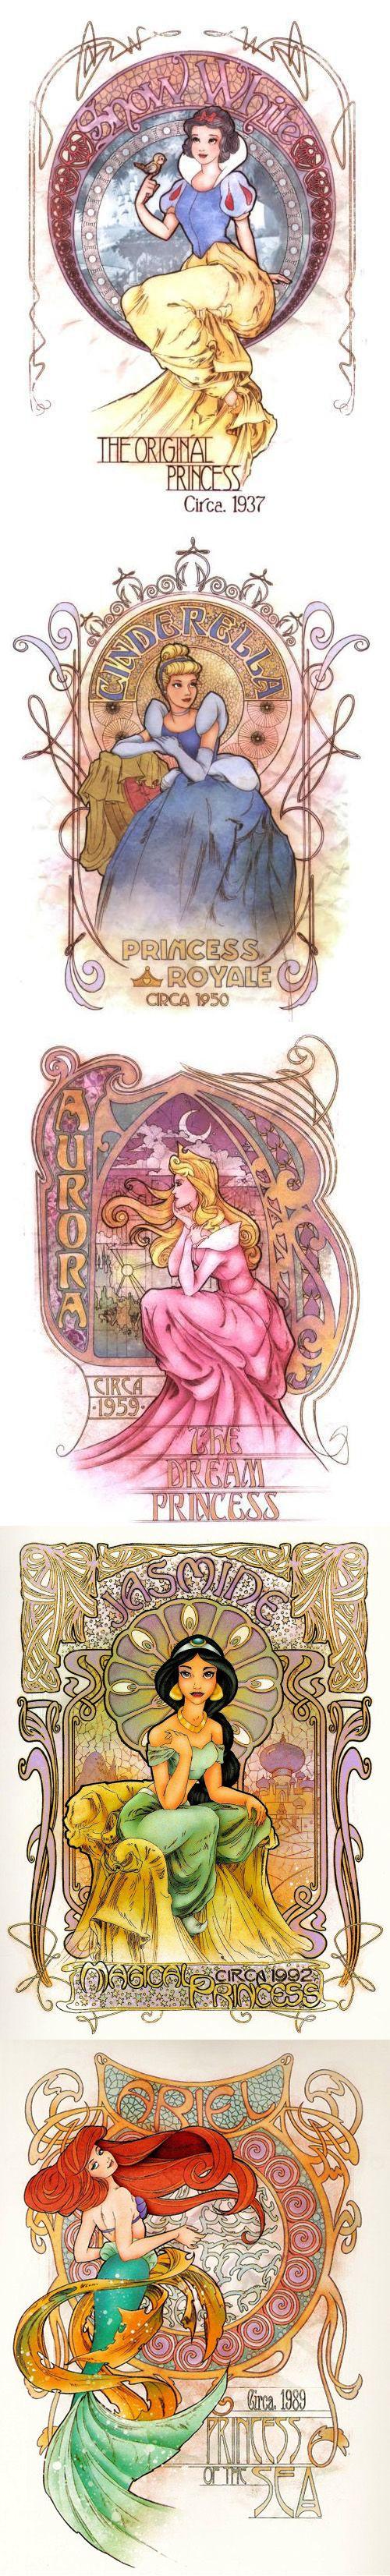 Disney Art Nouveau by Enrique Pita & Ed Irizzary